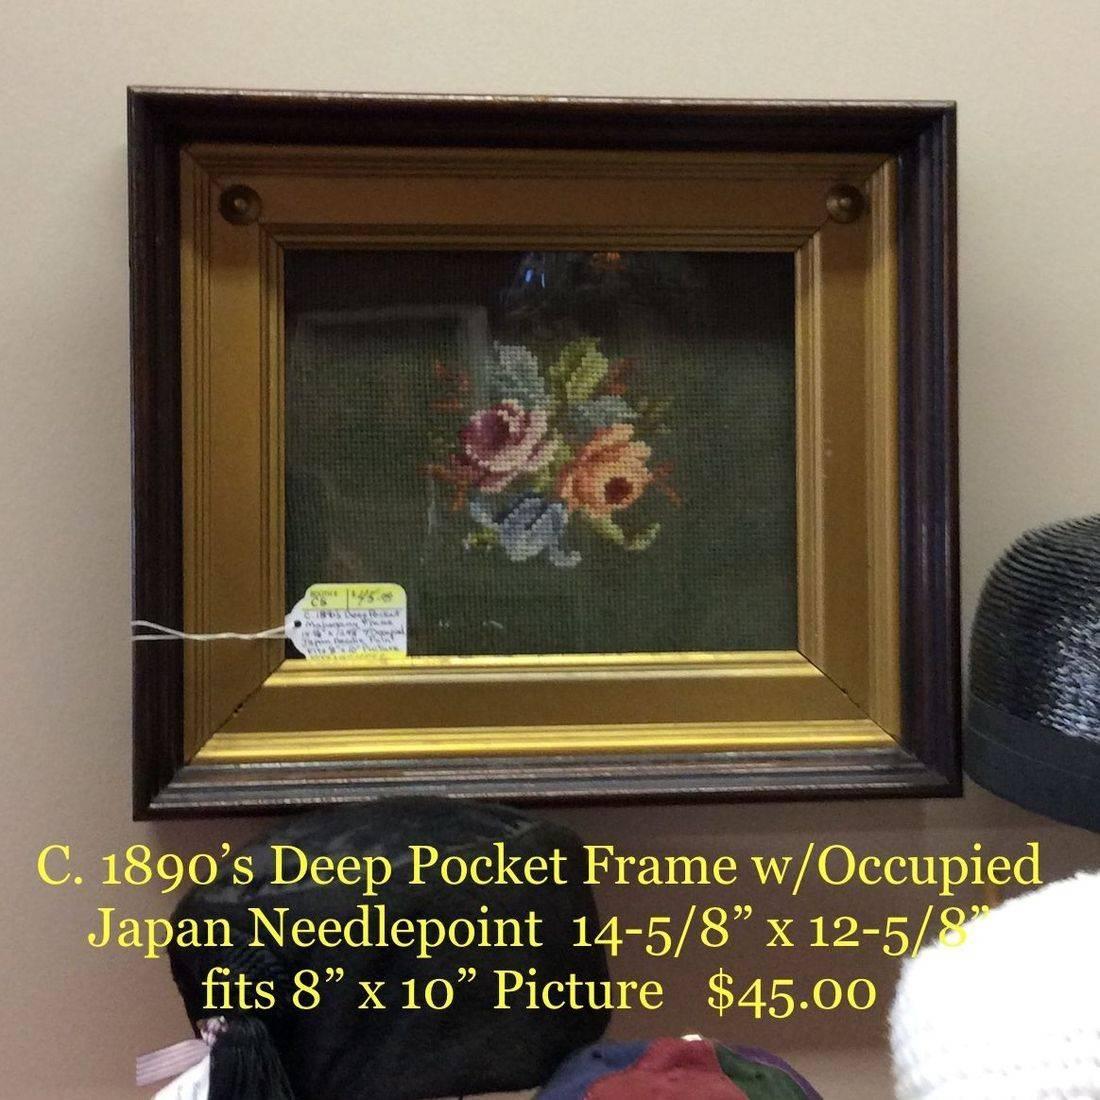 "C. 1890's Deep Pocket Frame w/Occupied Japan Needlepoint  14-5/8"" x 12-5/8""  fits 8"" x10"" pic.  $45.00"